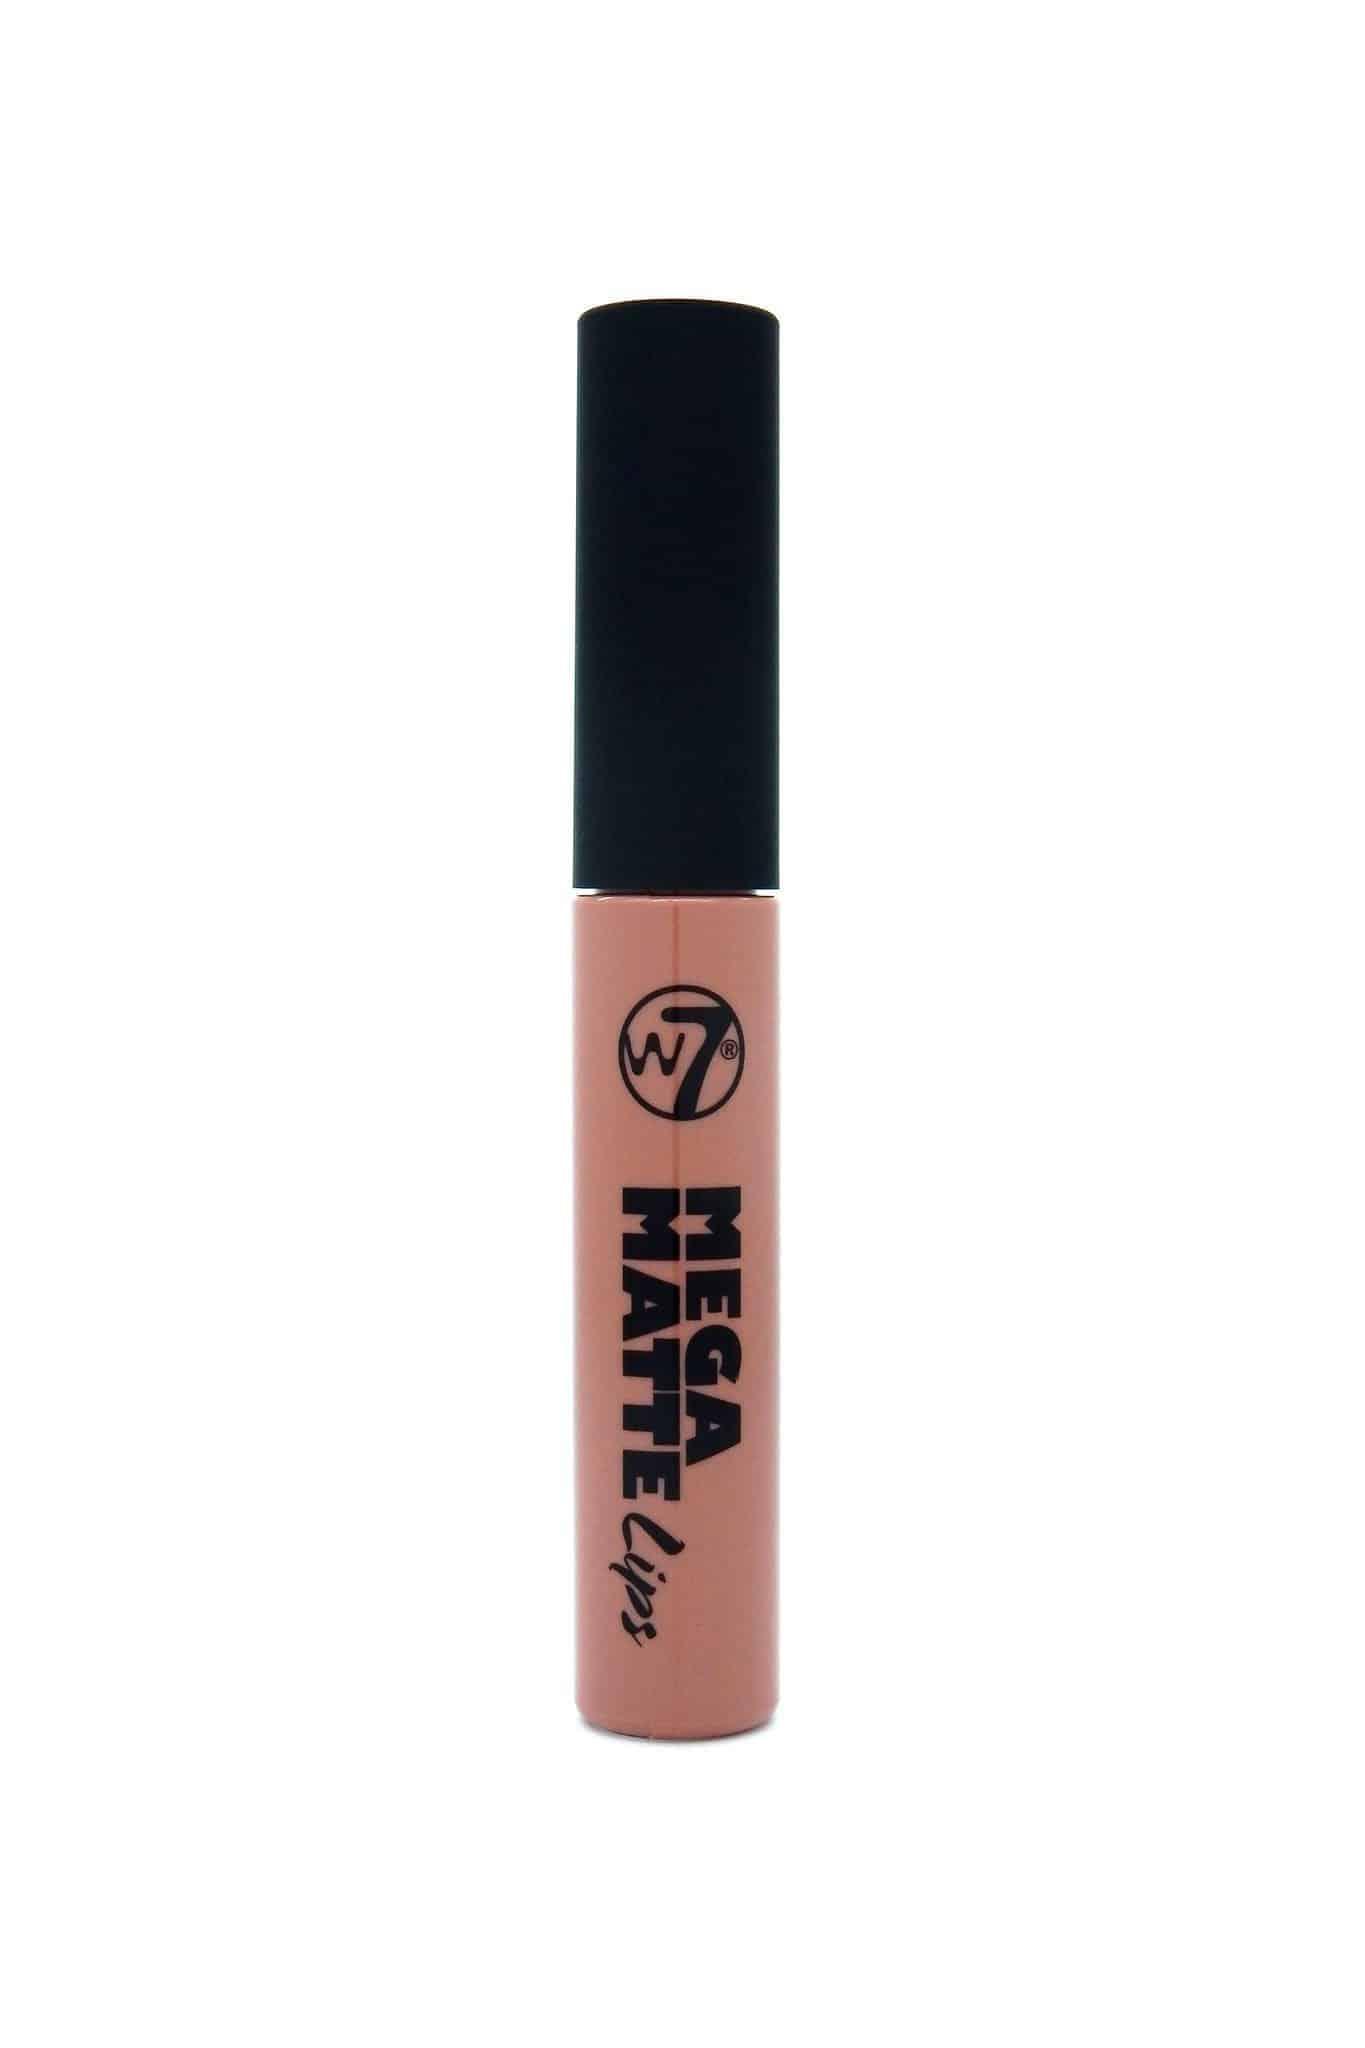 W7 Mega Matte Lips Nude Течно Матово Червило Mega